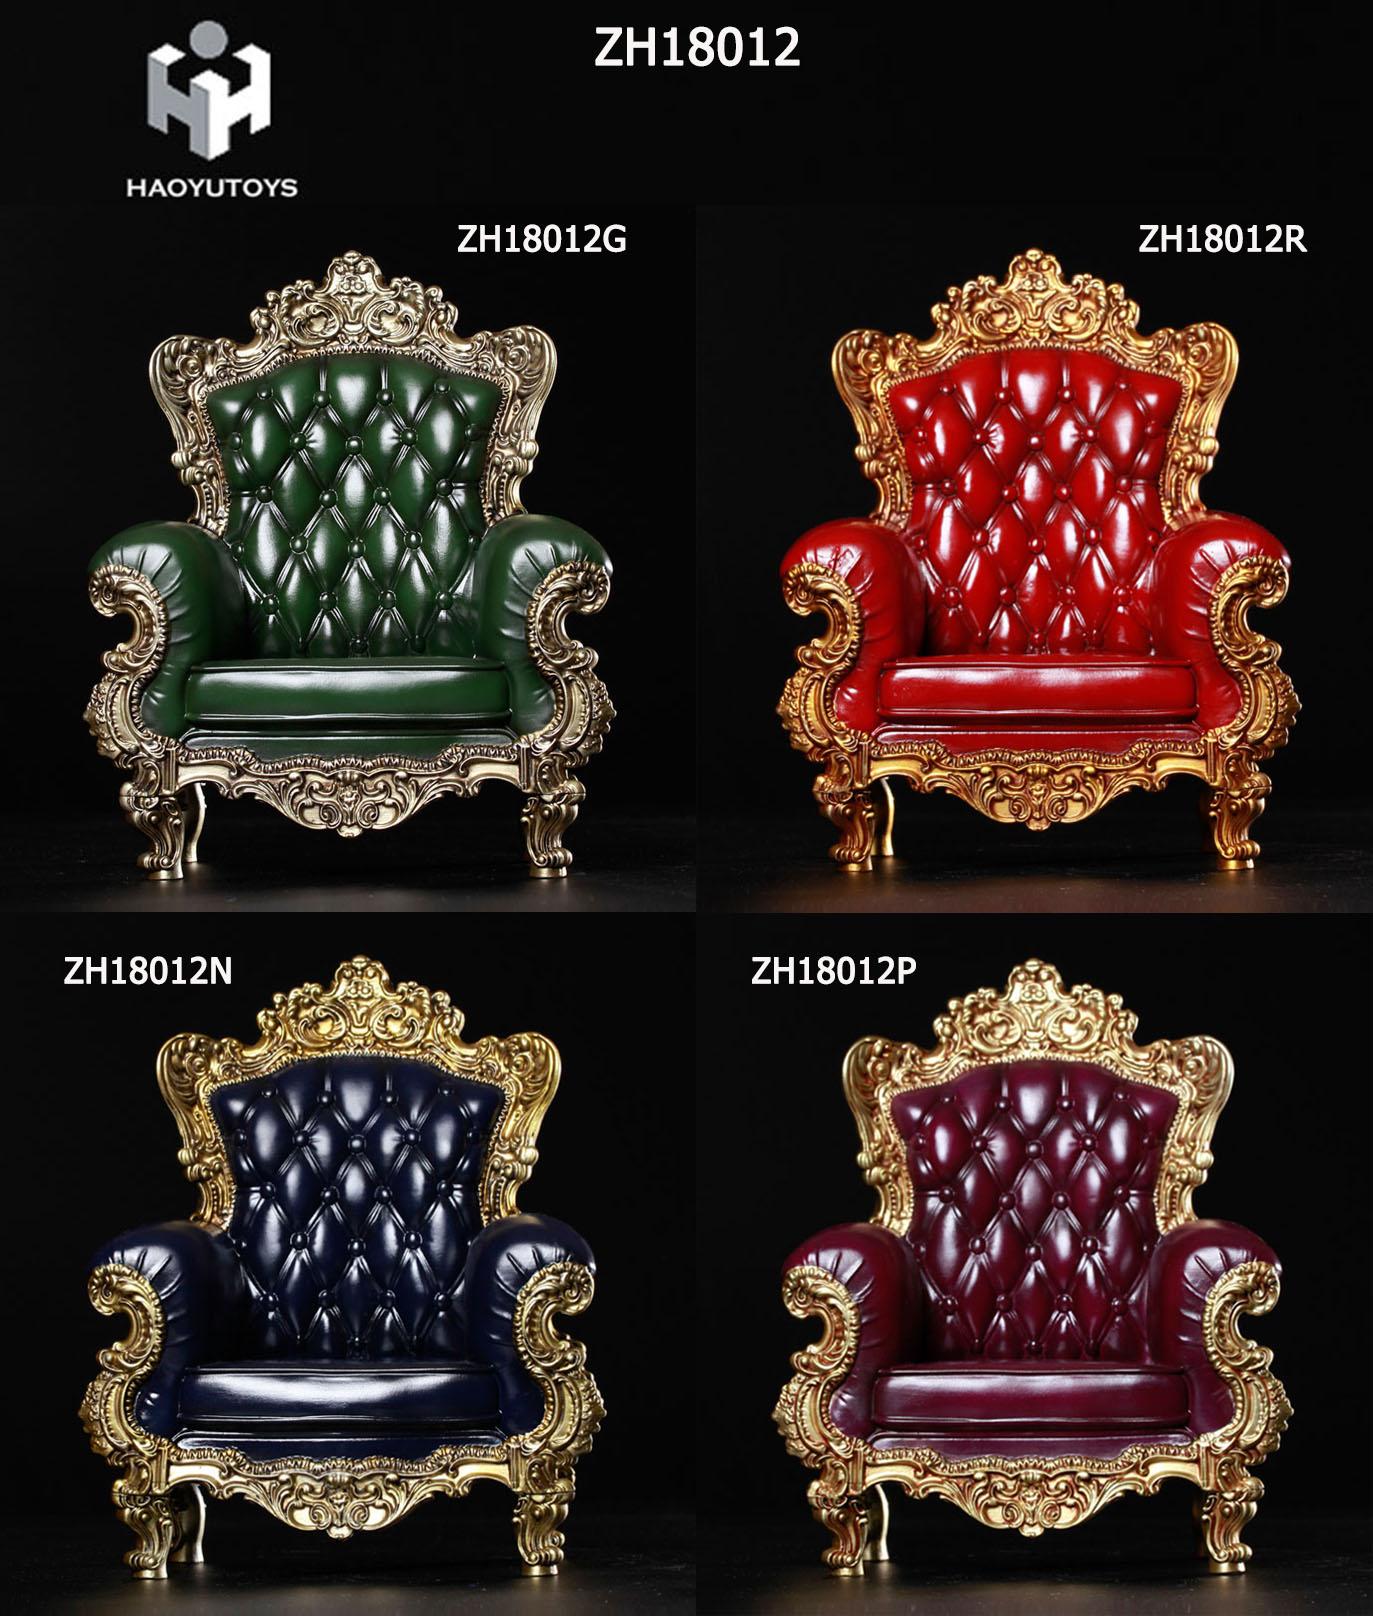 HaoYuToys ZH18012 Sofa